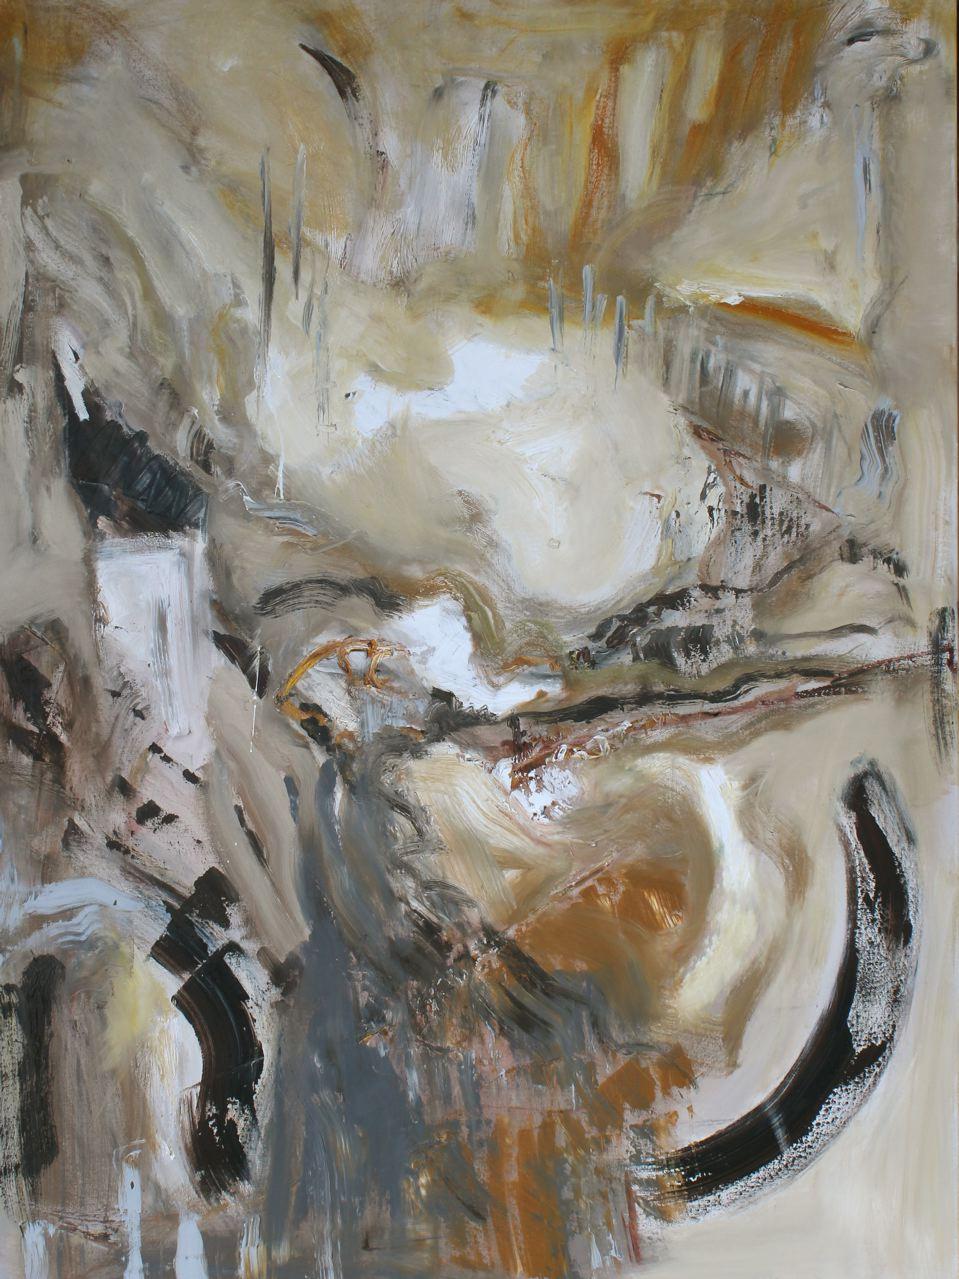 LJ-010, Elevation, 36x48, oil on canvas, 2015, $3,200